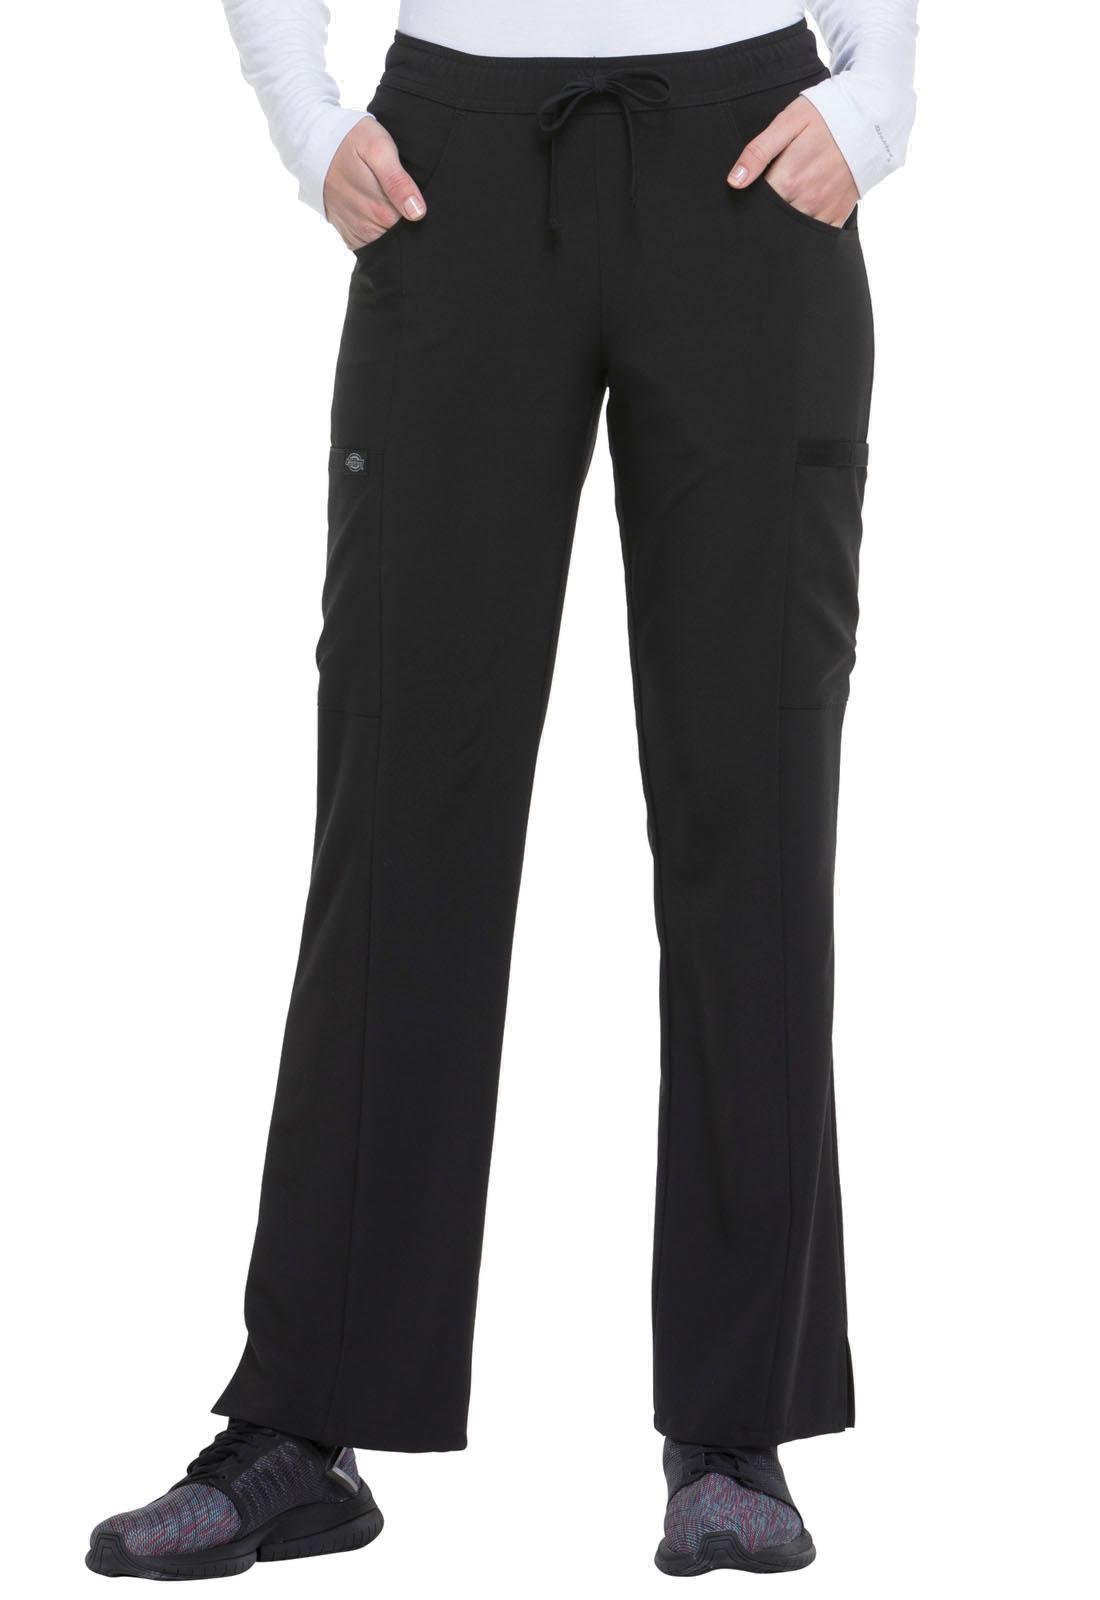 876076fefc1 EDS Essentials Mid Rise Straight Leg Drawstring Pant in Black DK010 ...